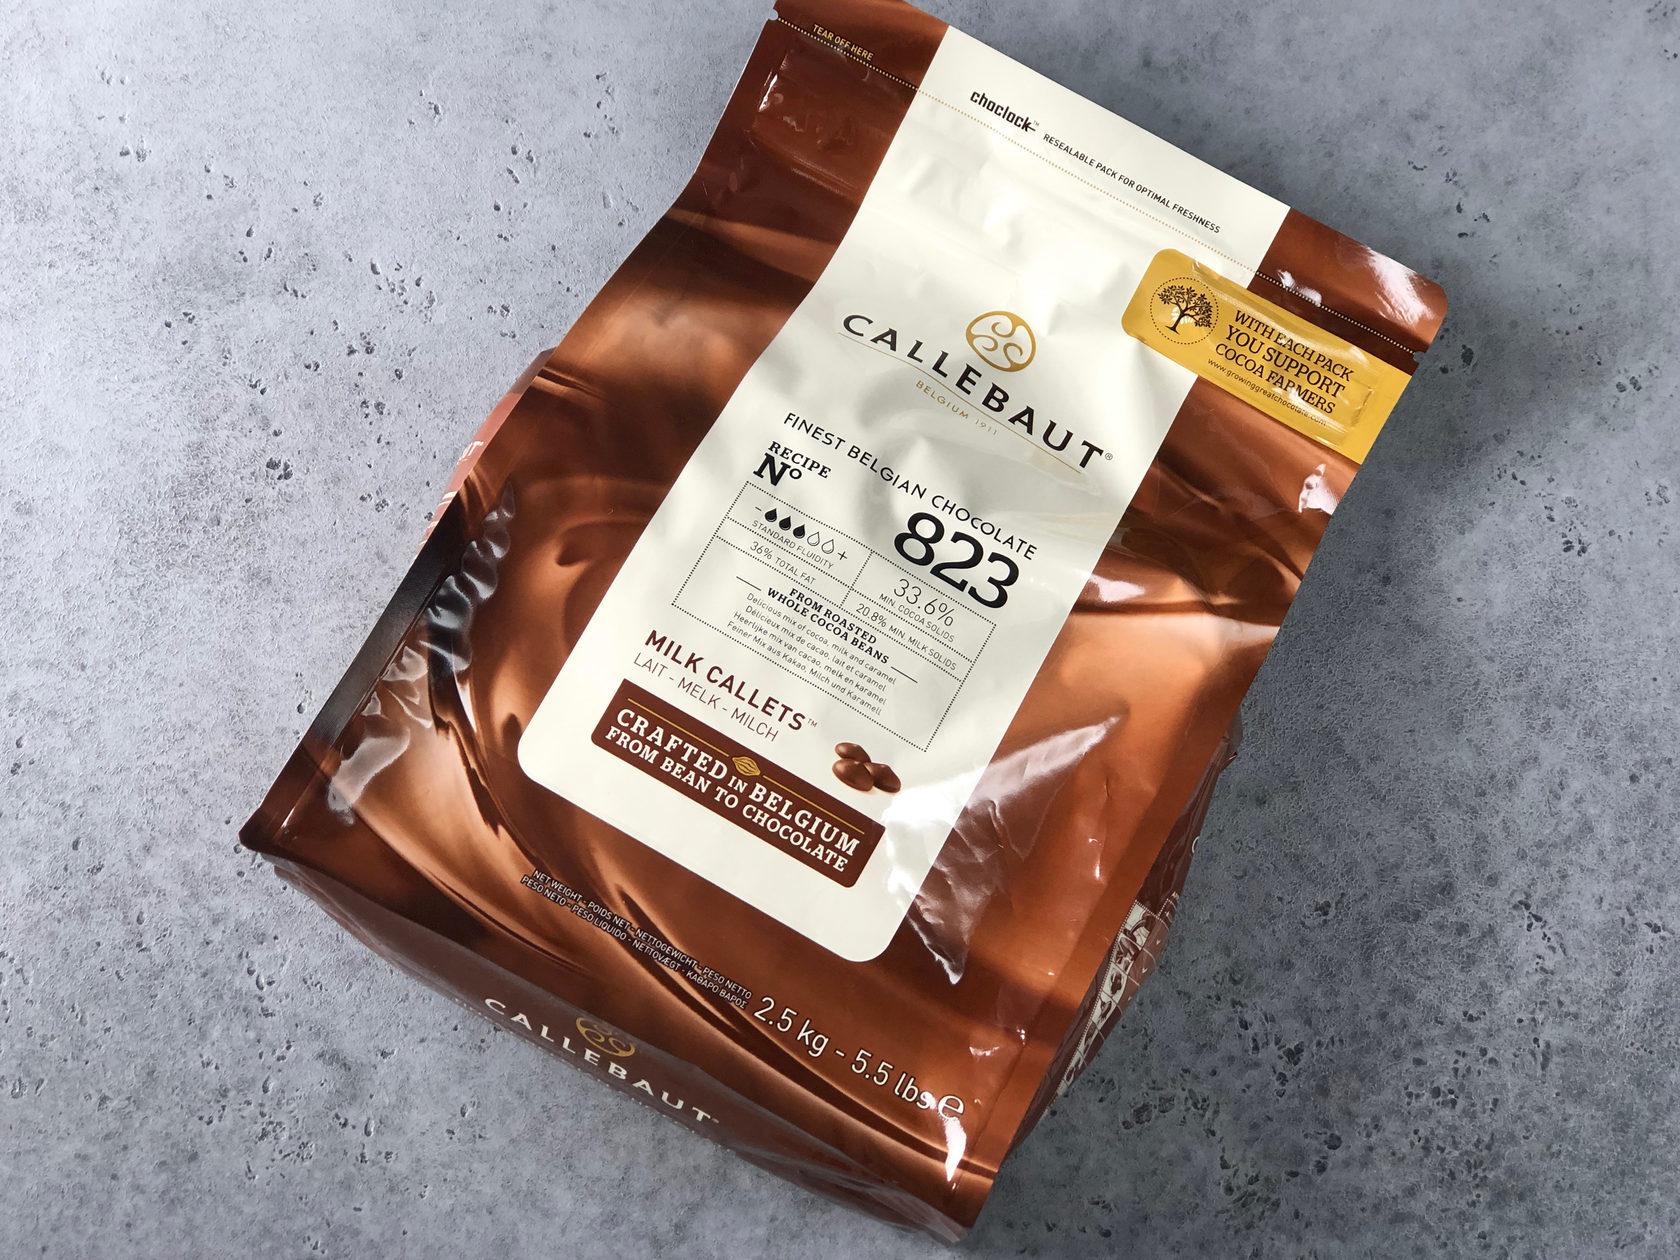 Шоколад молочный Barry Callebaut 33,6%, 2,5 кг